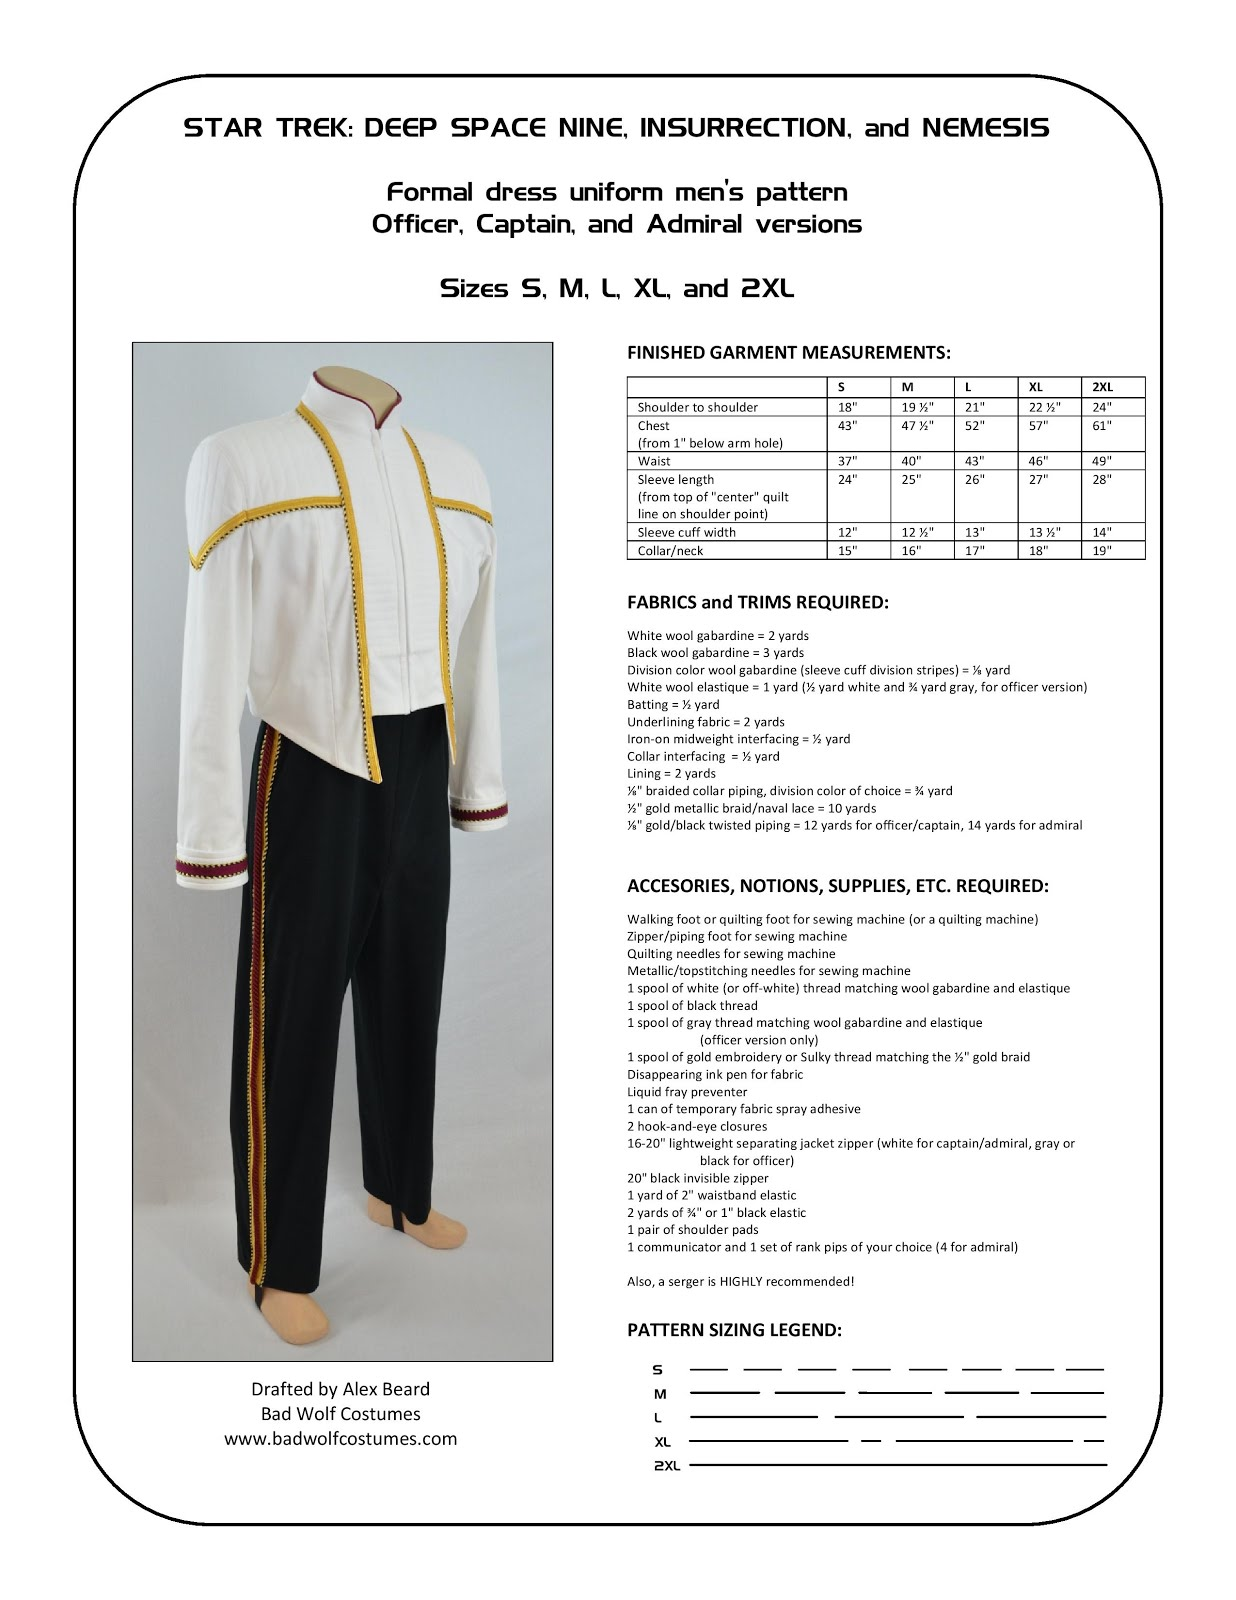 Star Trek: DS9/NEM Men's Formal Uniform Sewing Pattern